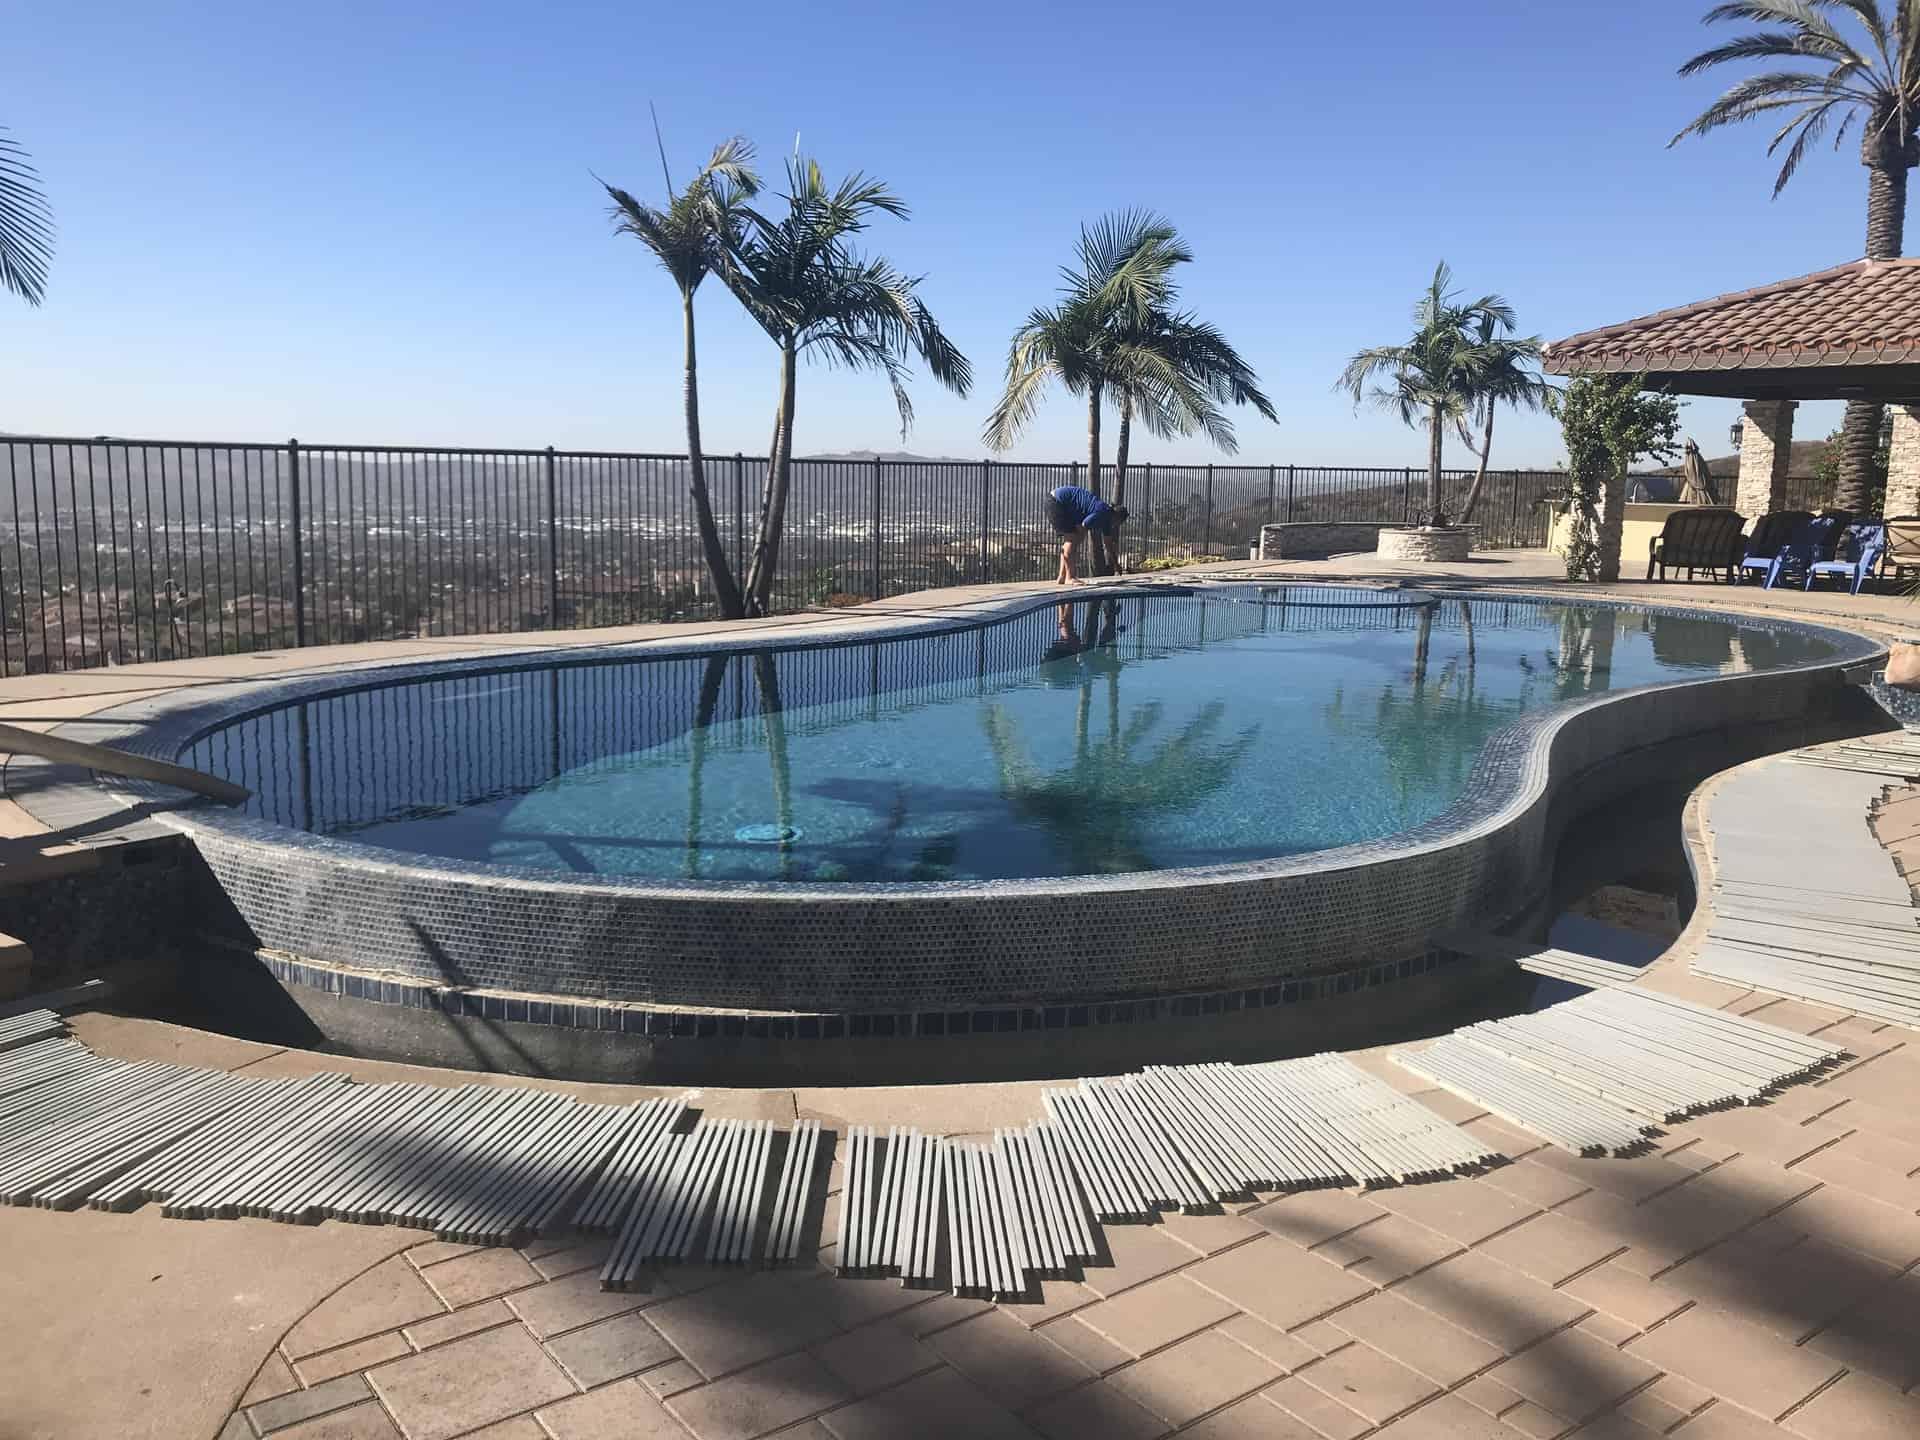 Pool tile cleaning calif pool heaven inc expert pool - Swimming pool tile cleaning machine ...